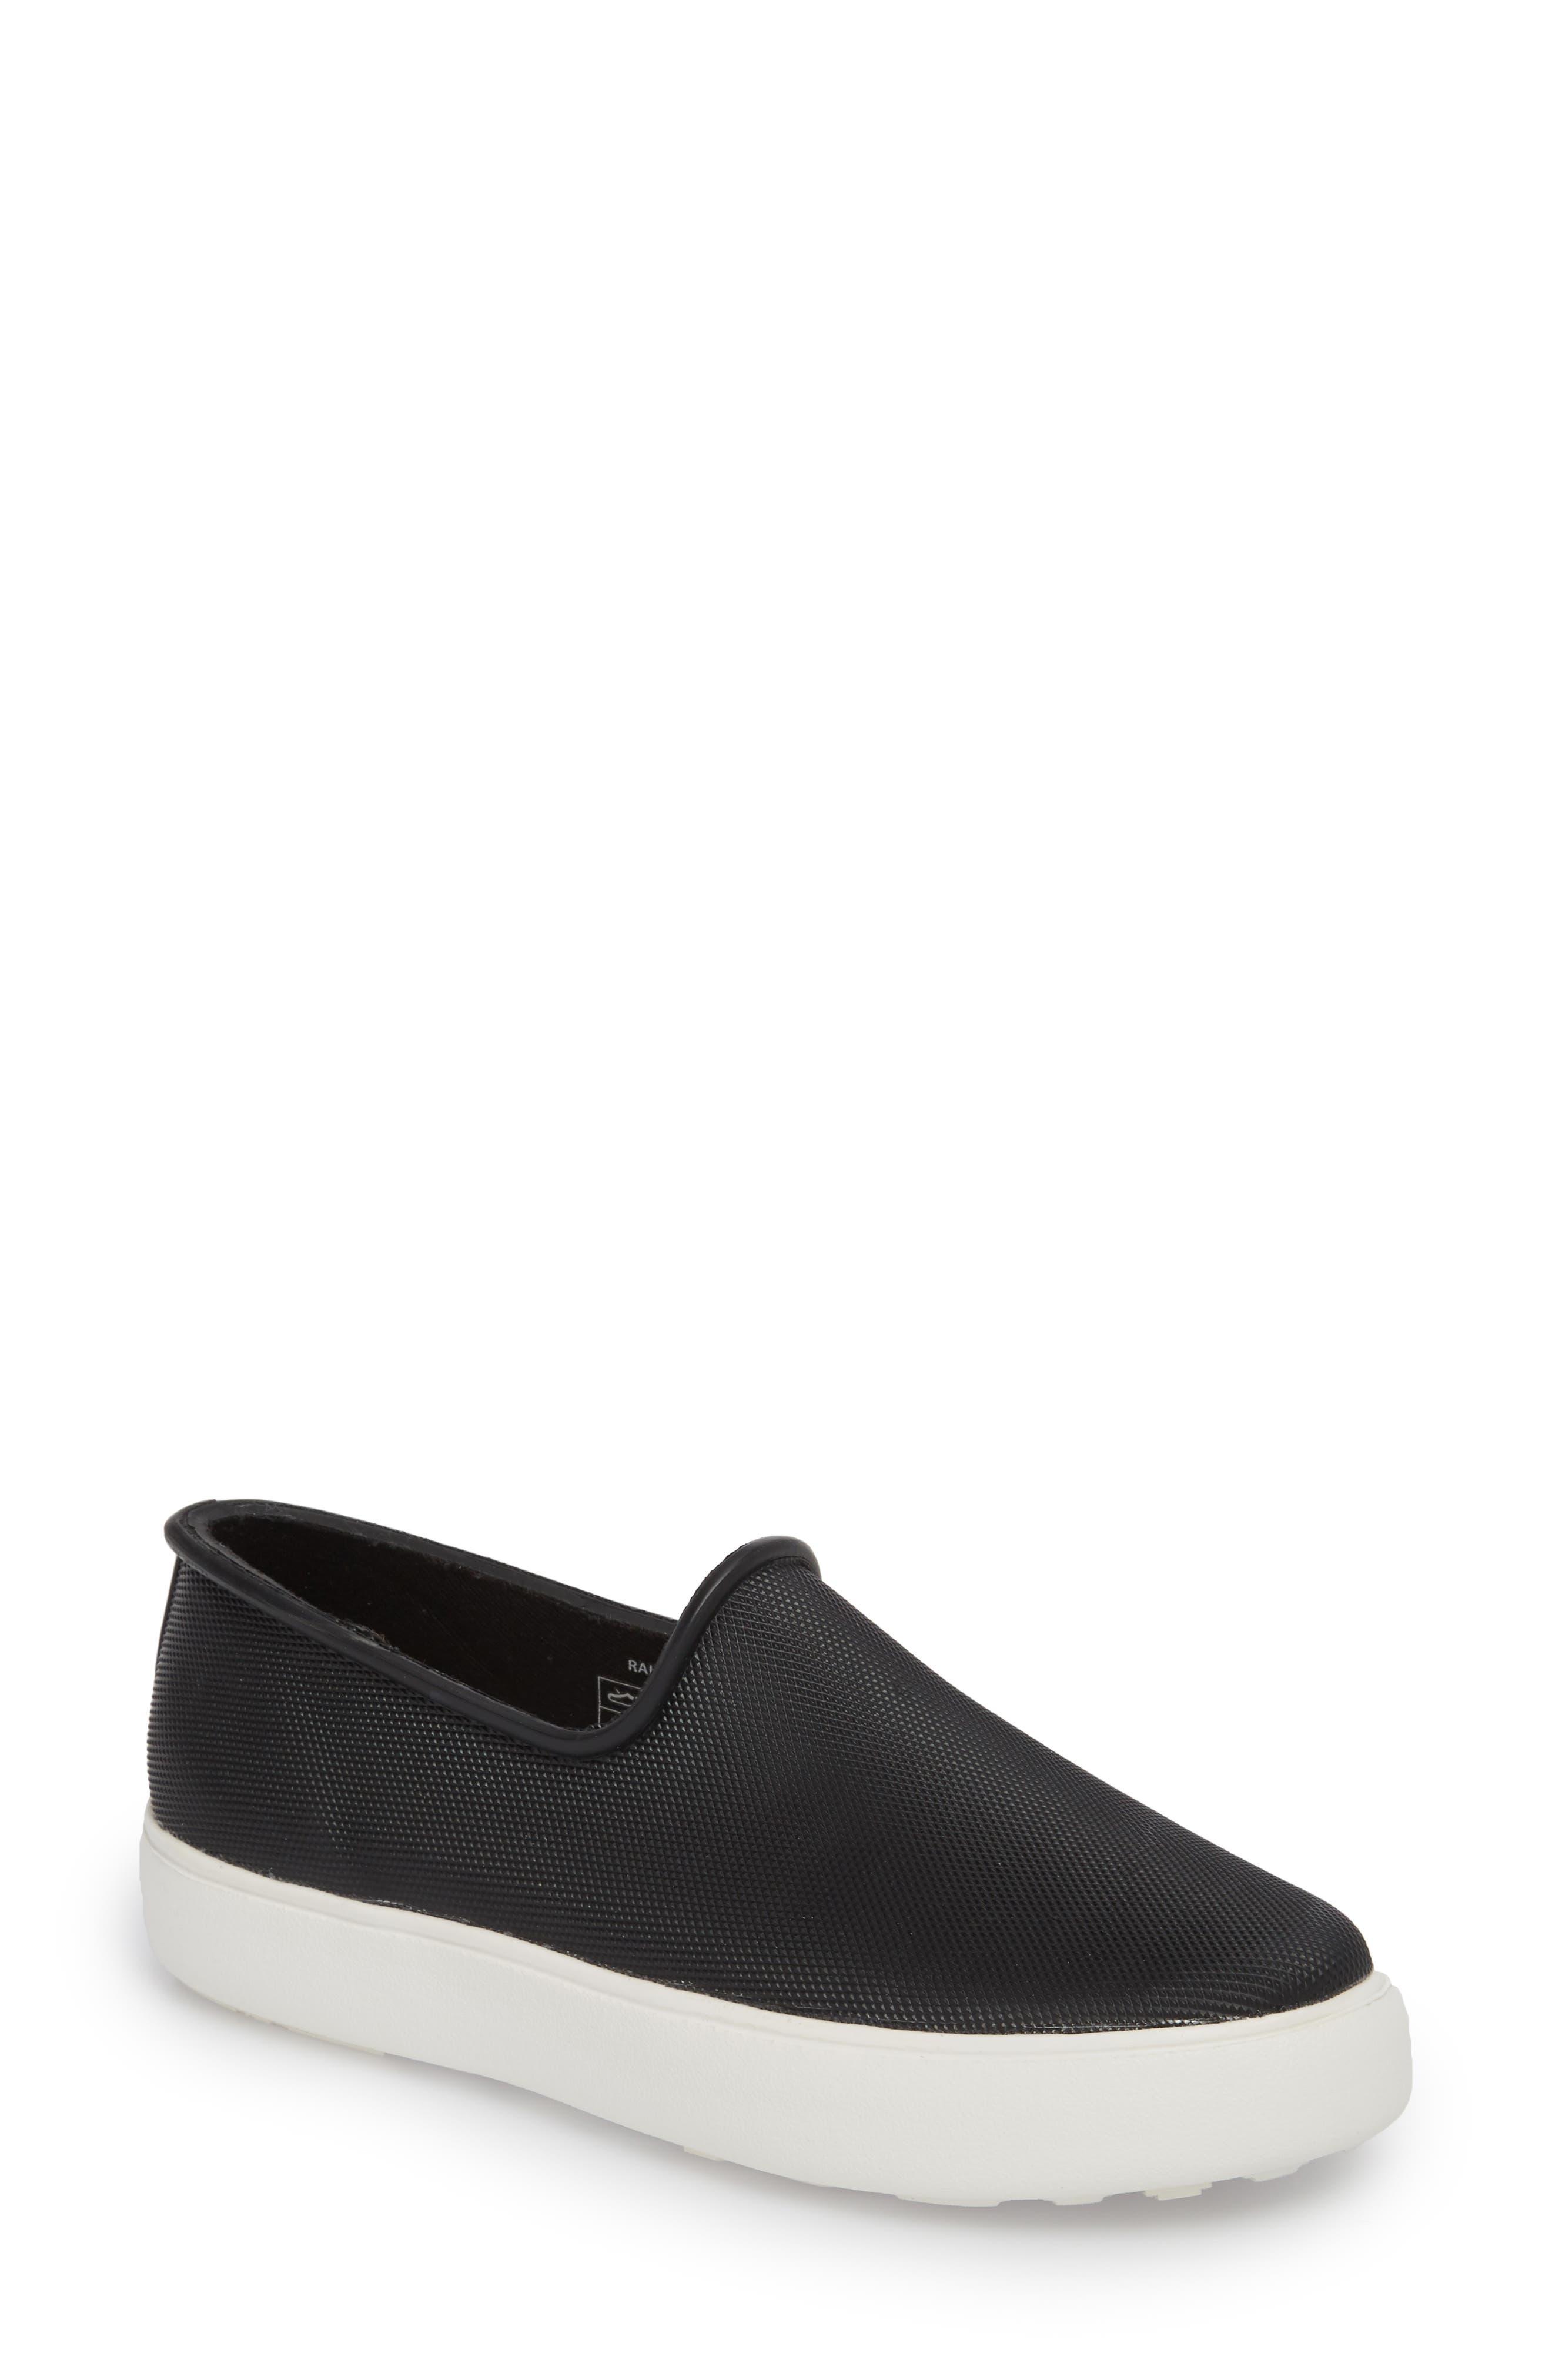 Rainy Day Waterproof Slip-On Sneaker,                         Main,                         color, 001